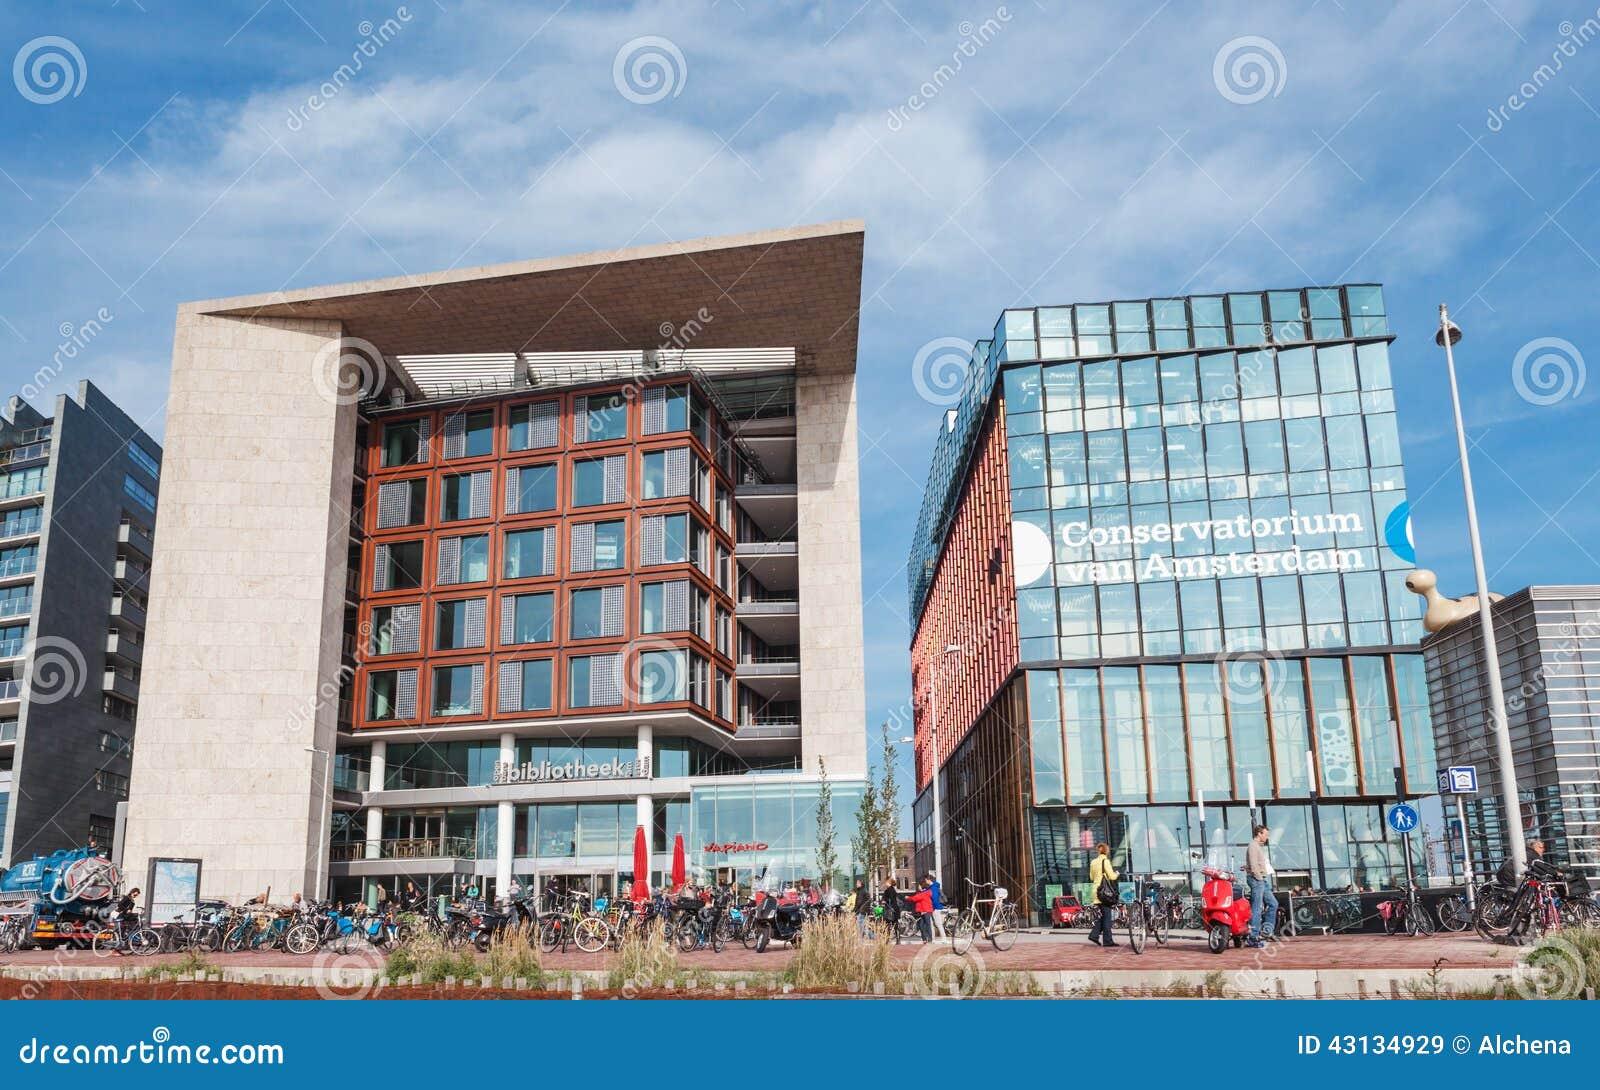 Moderne gebouwen van serre en bibliotheek in amsterdam redactionele stock afbeelding - Moderne bibliotheek ...